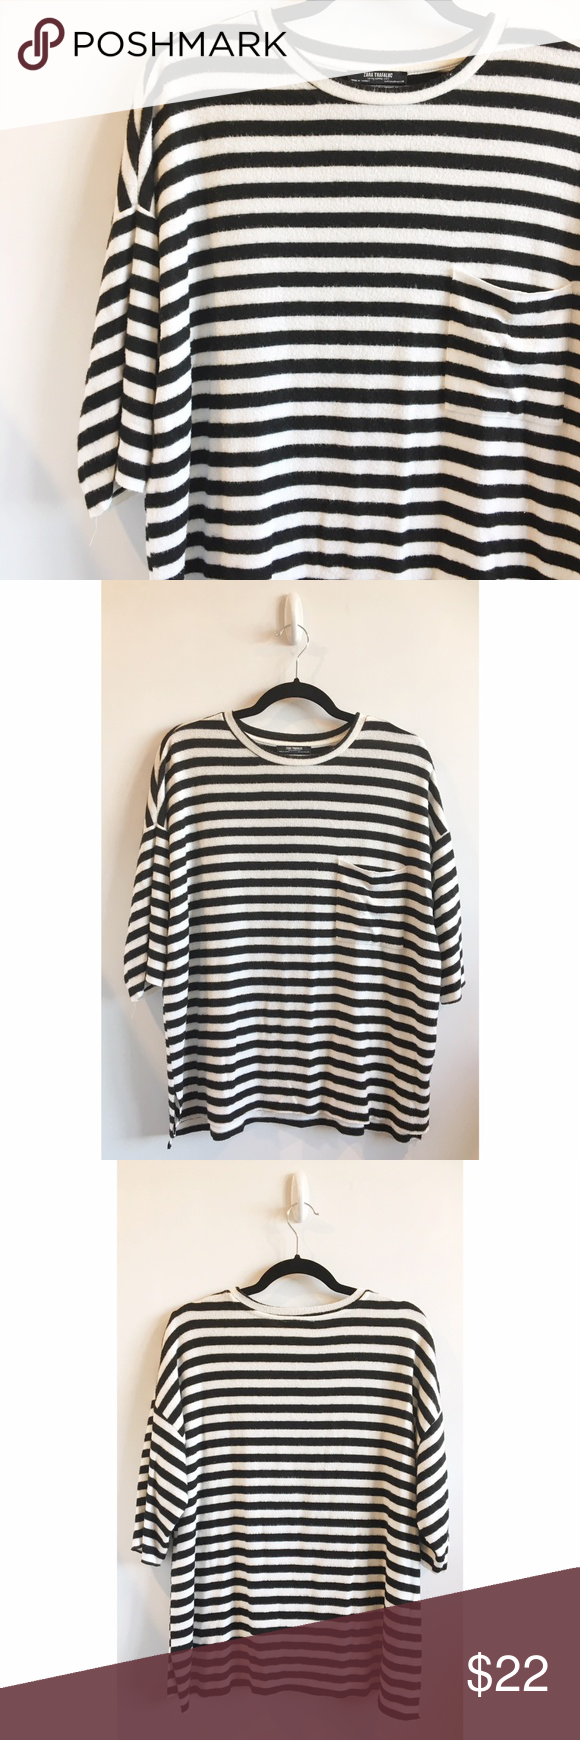 efb23bb7fd Zara Black & White Striped Fuzzy T-Shirt - Zara Trafaluc fuzzy striped t- shirt - Soft and fuzzy black & white striped fabric - Oversized fit with  single ...